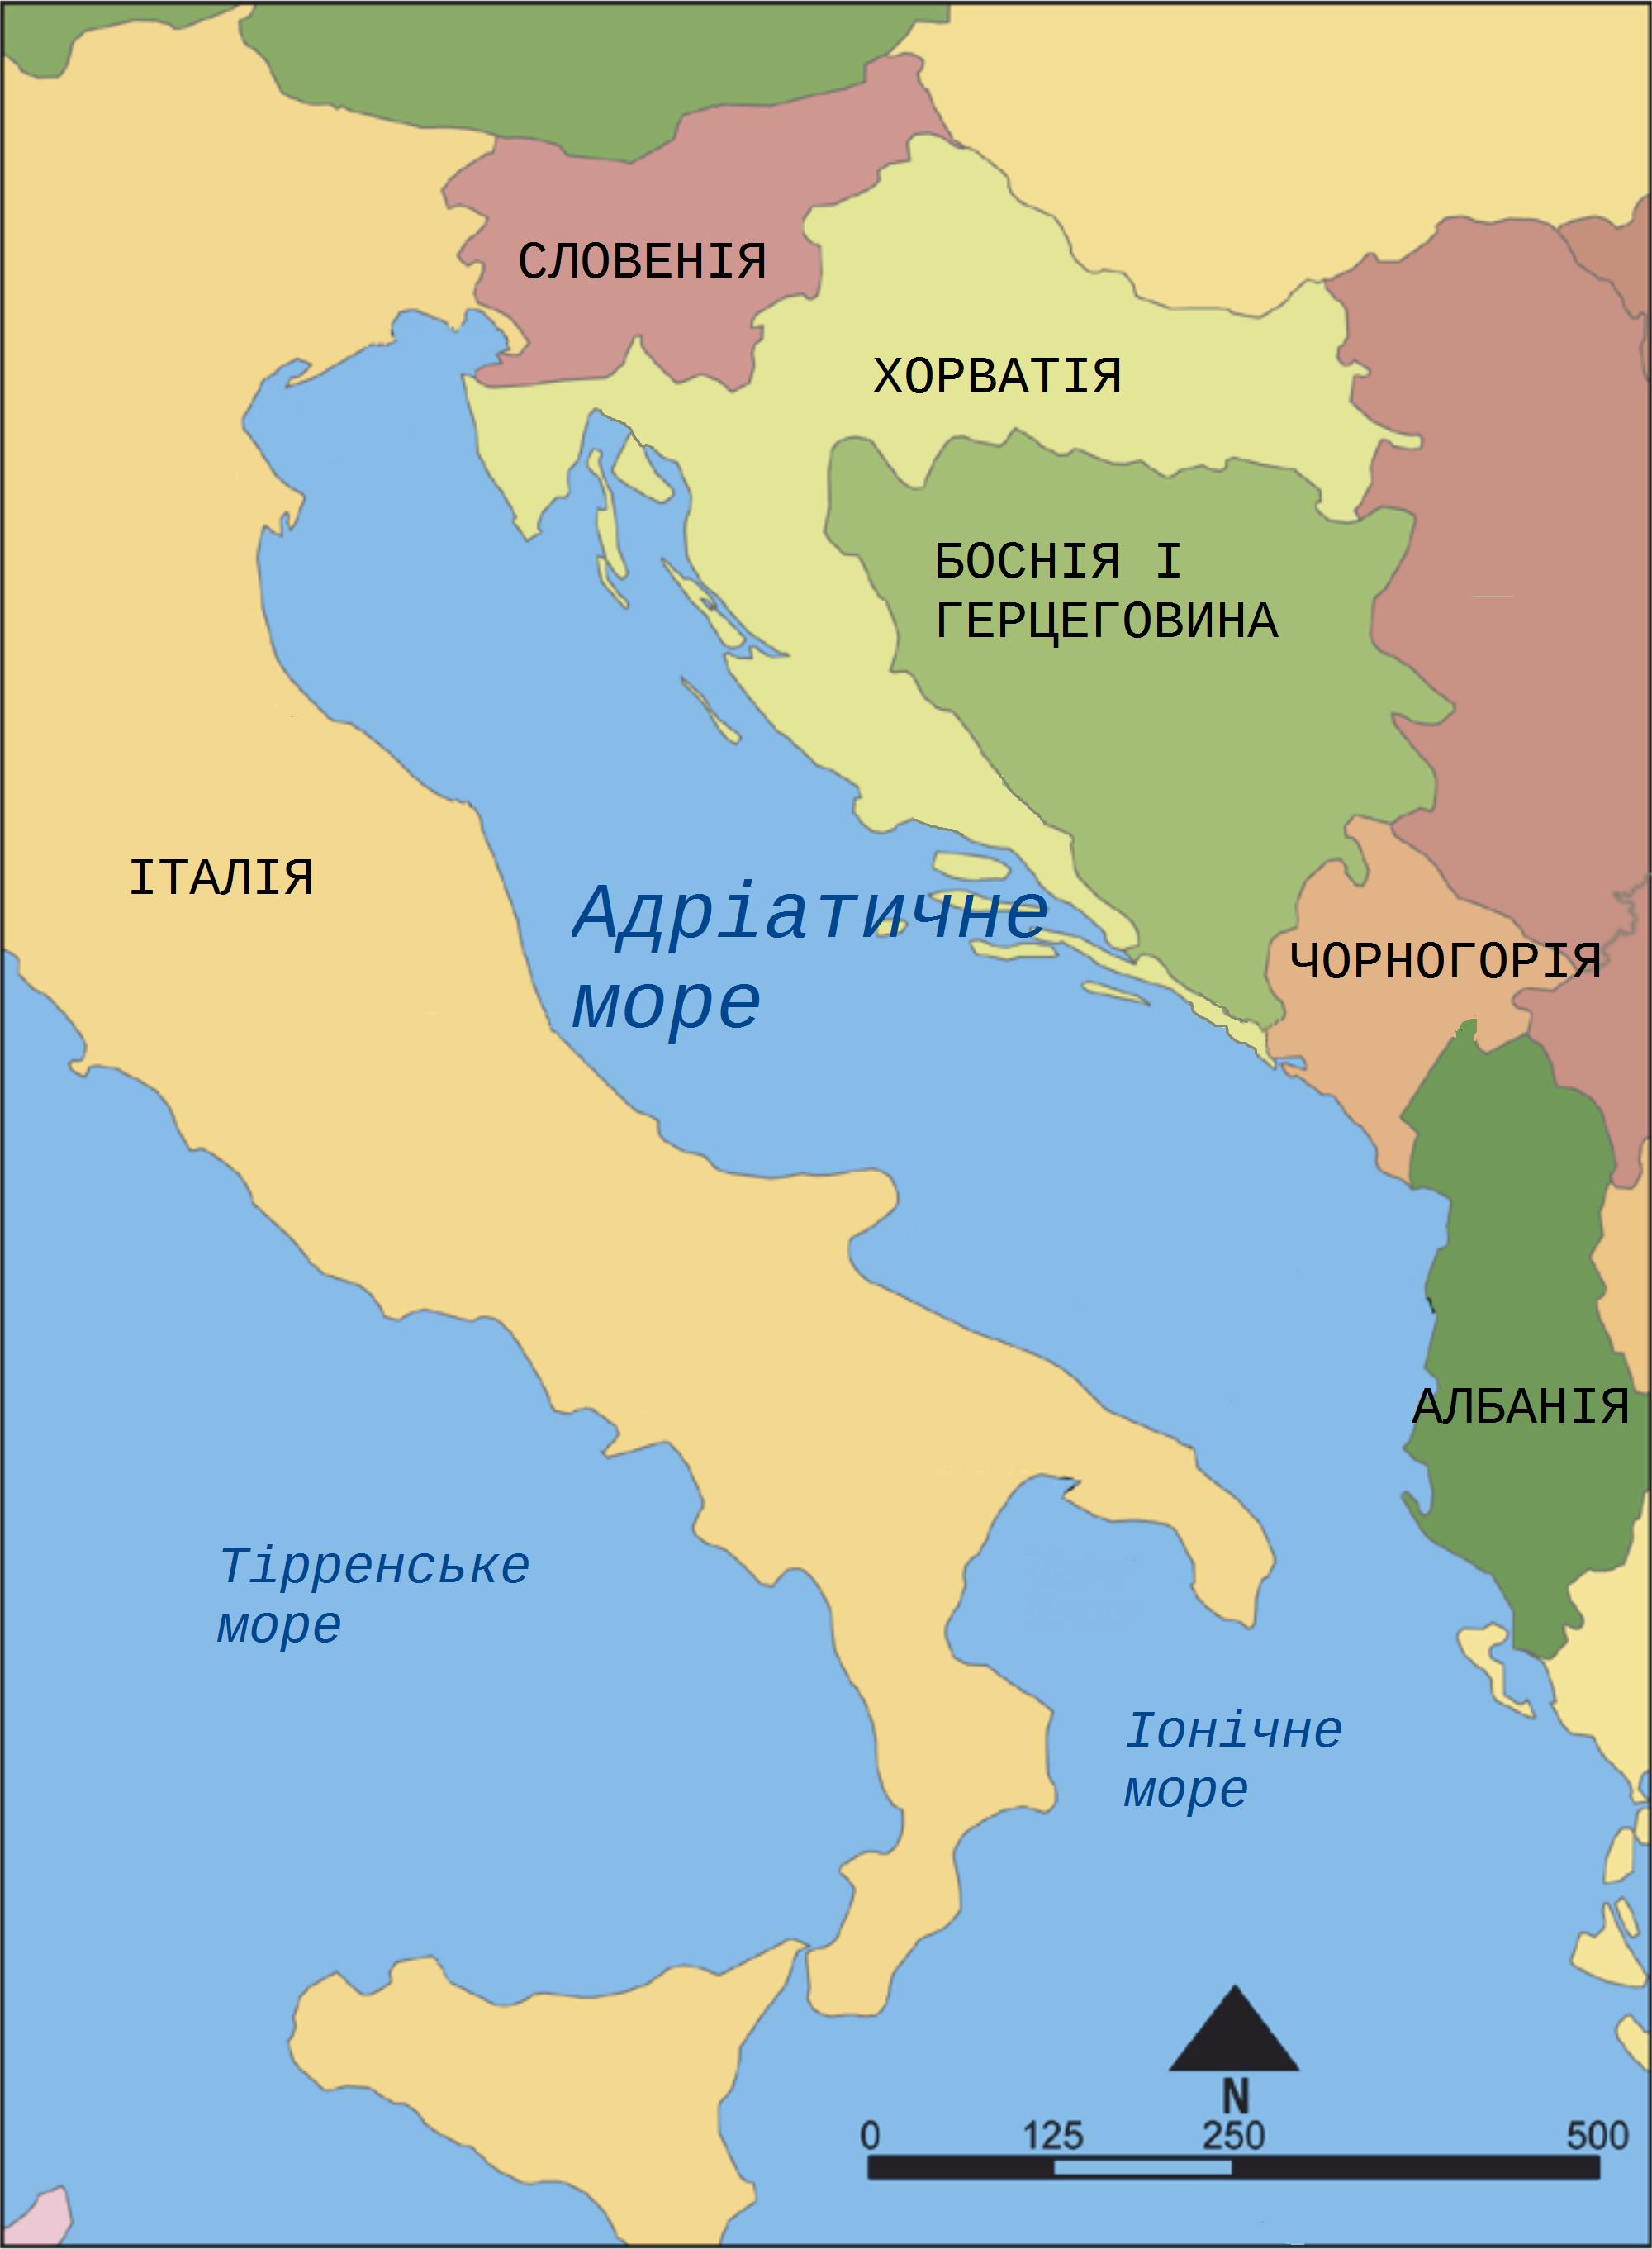 FileAdriatic Sea map ukpng Wikimedia Commons – Map Uk Org